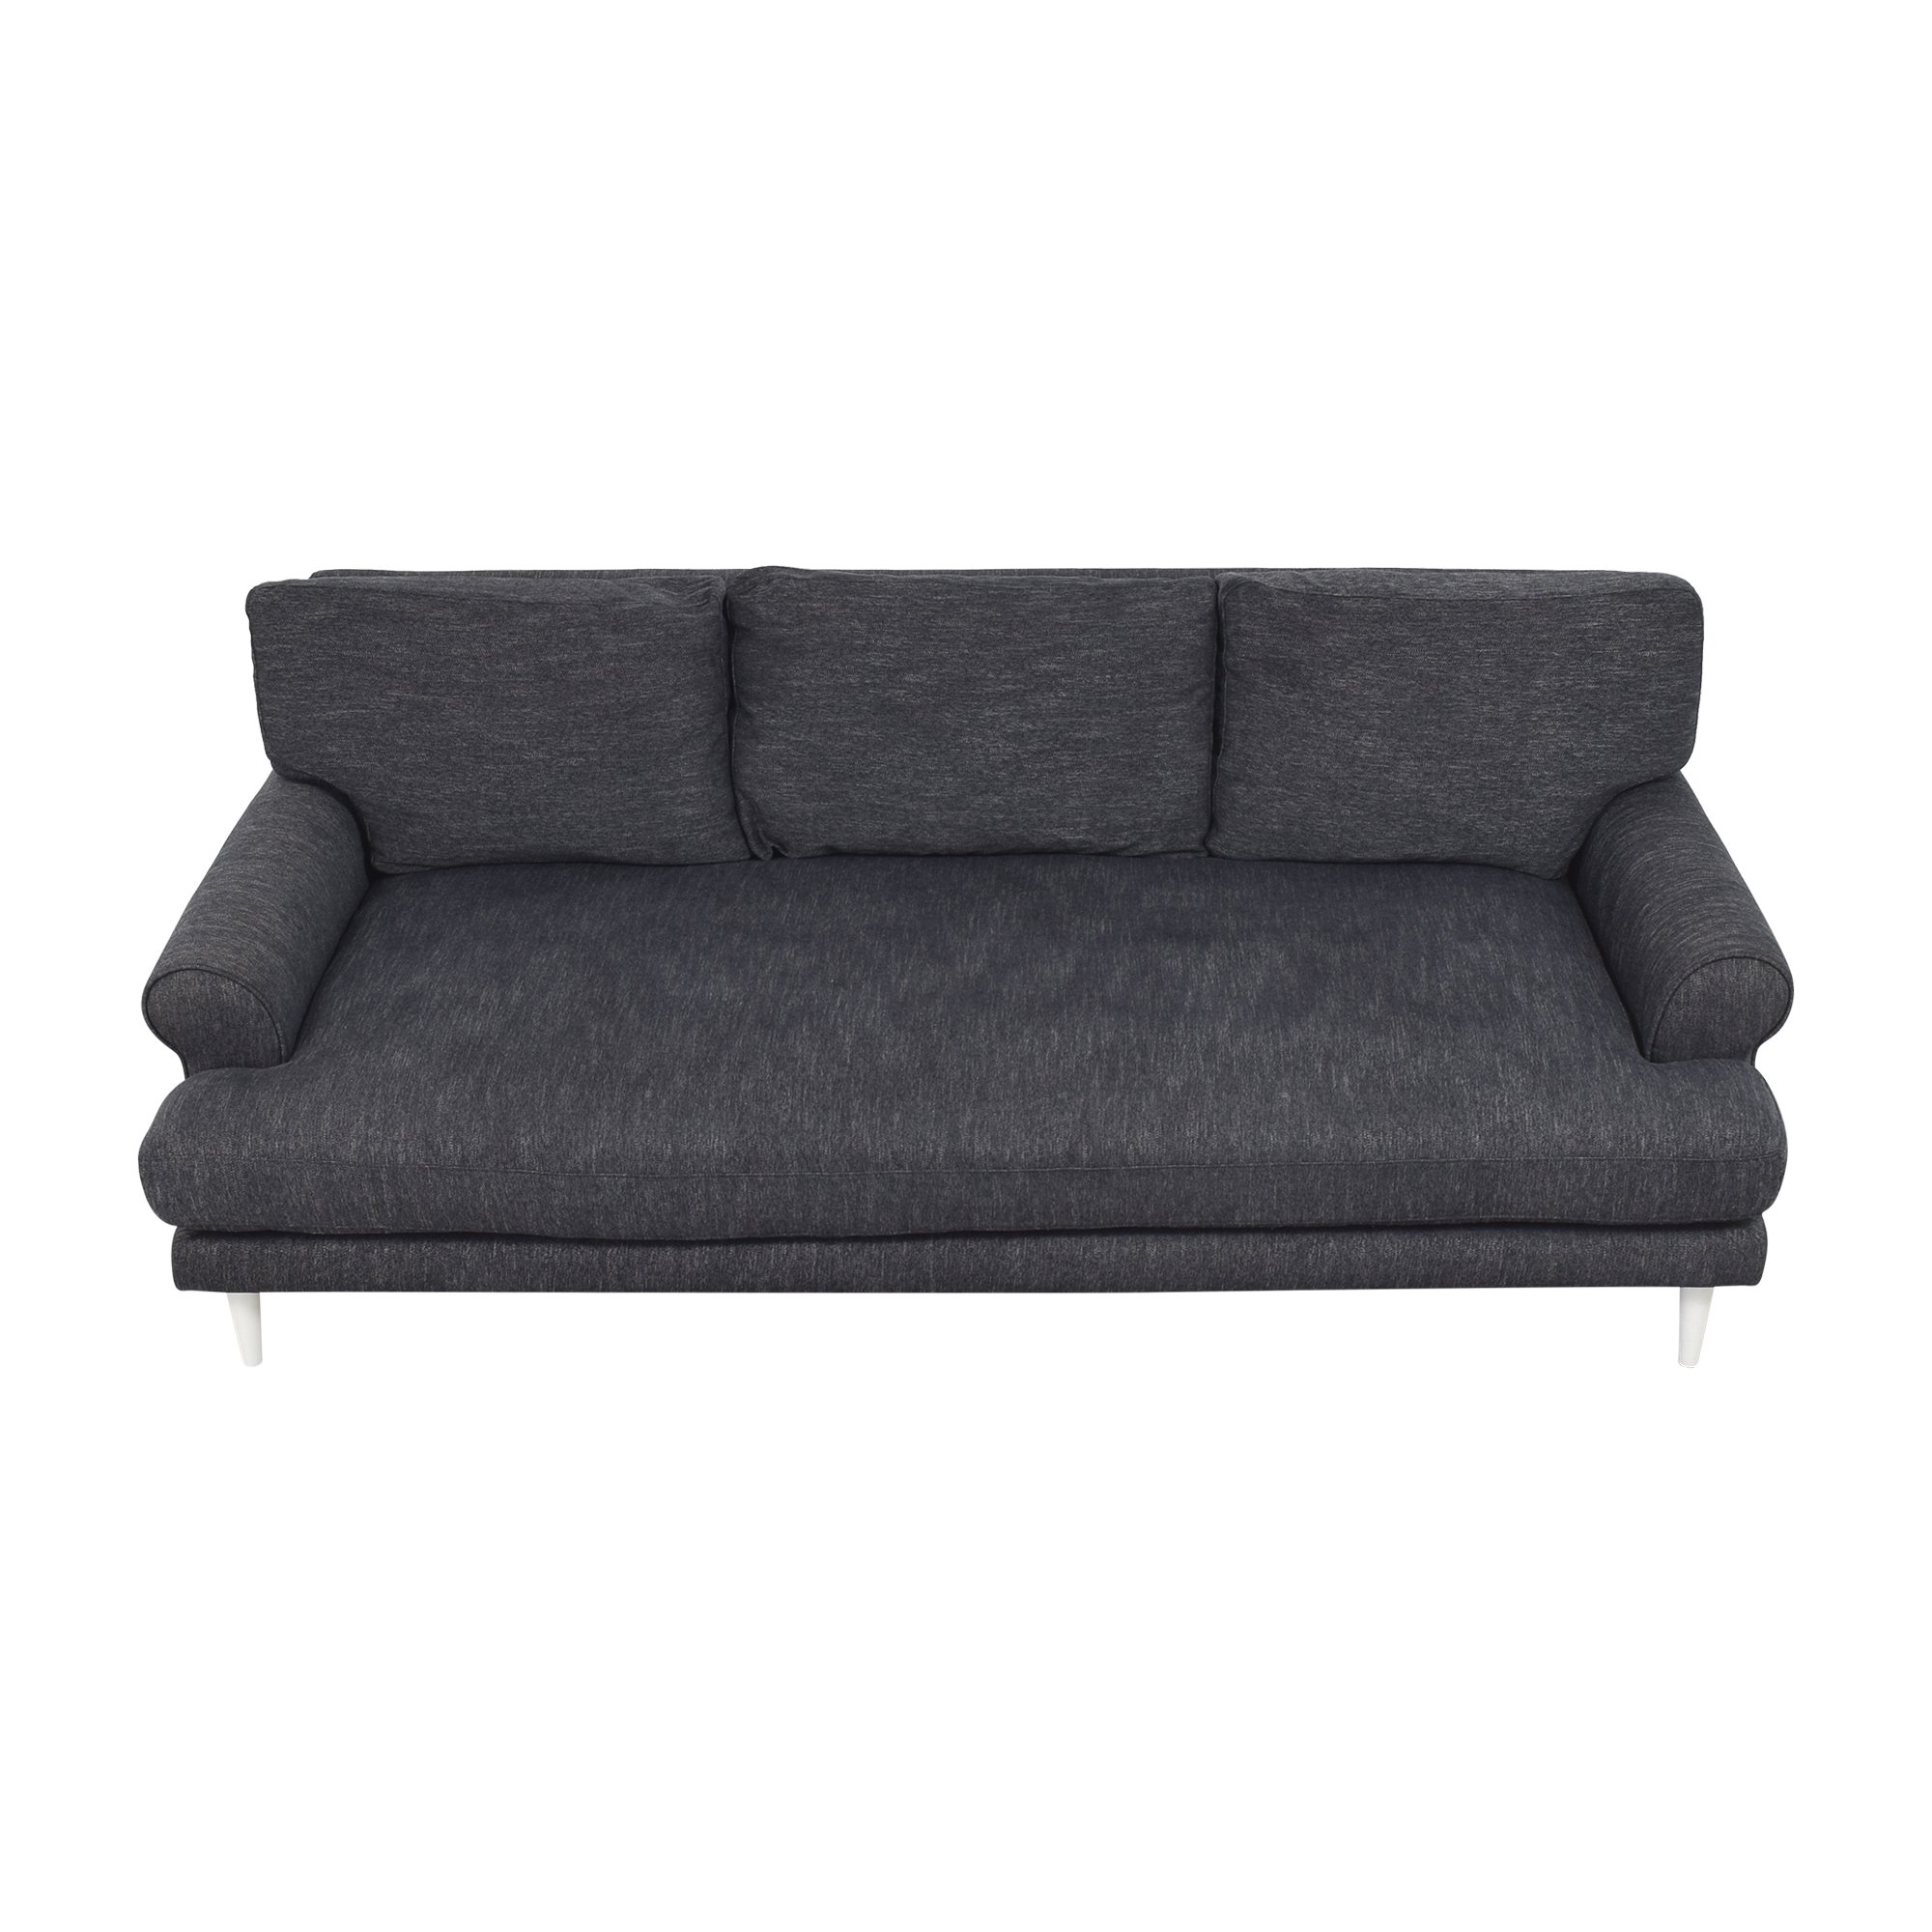 Interior Define Maxwell Bench Cushion Sofa / Sofas